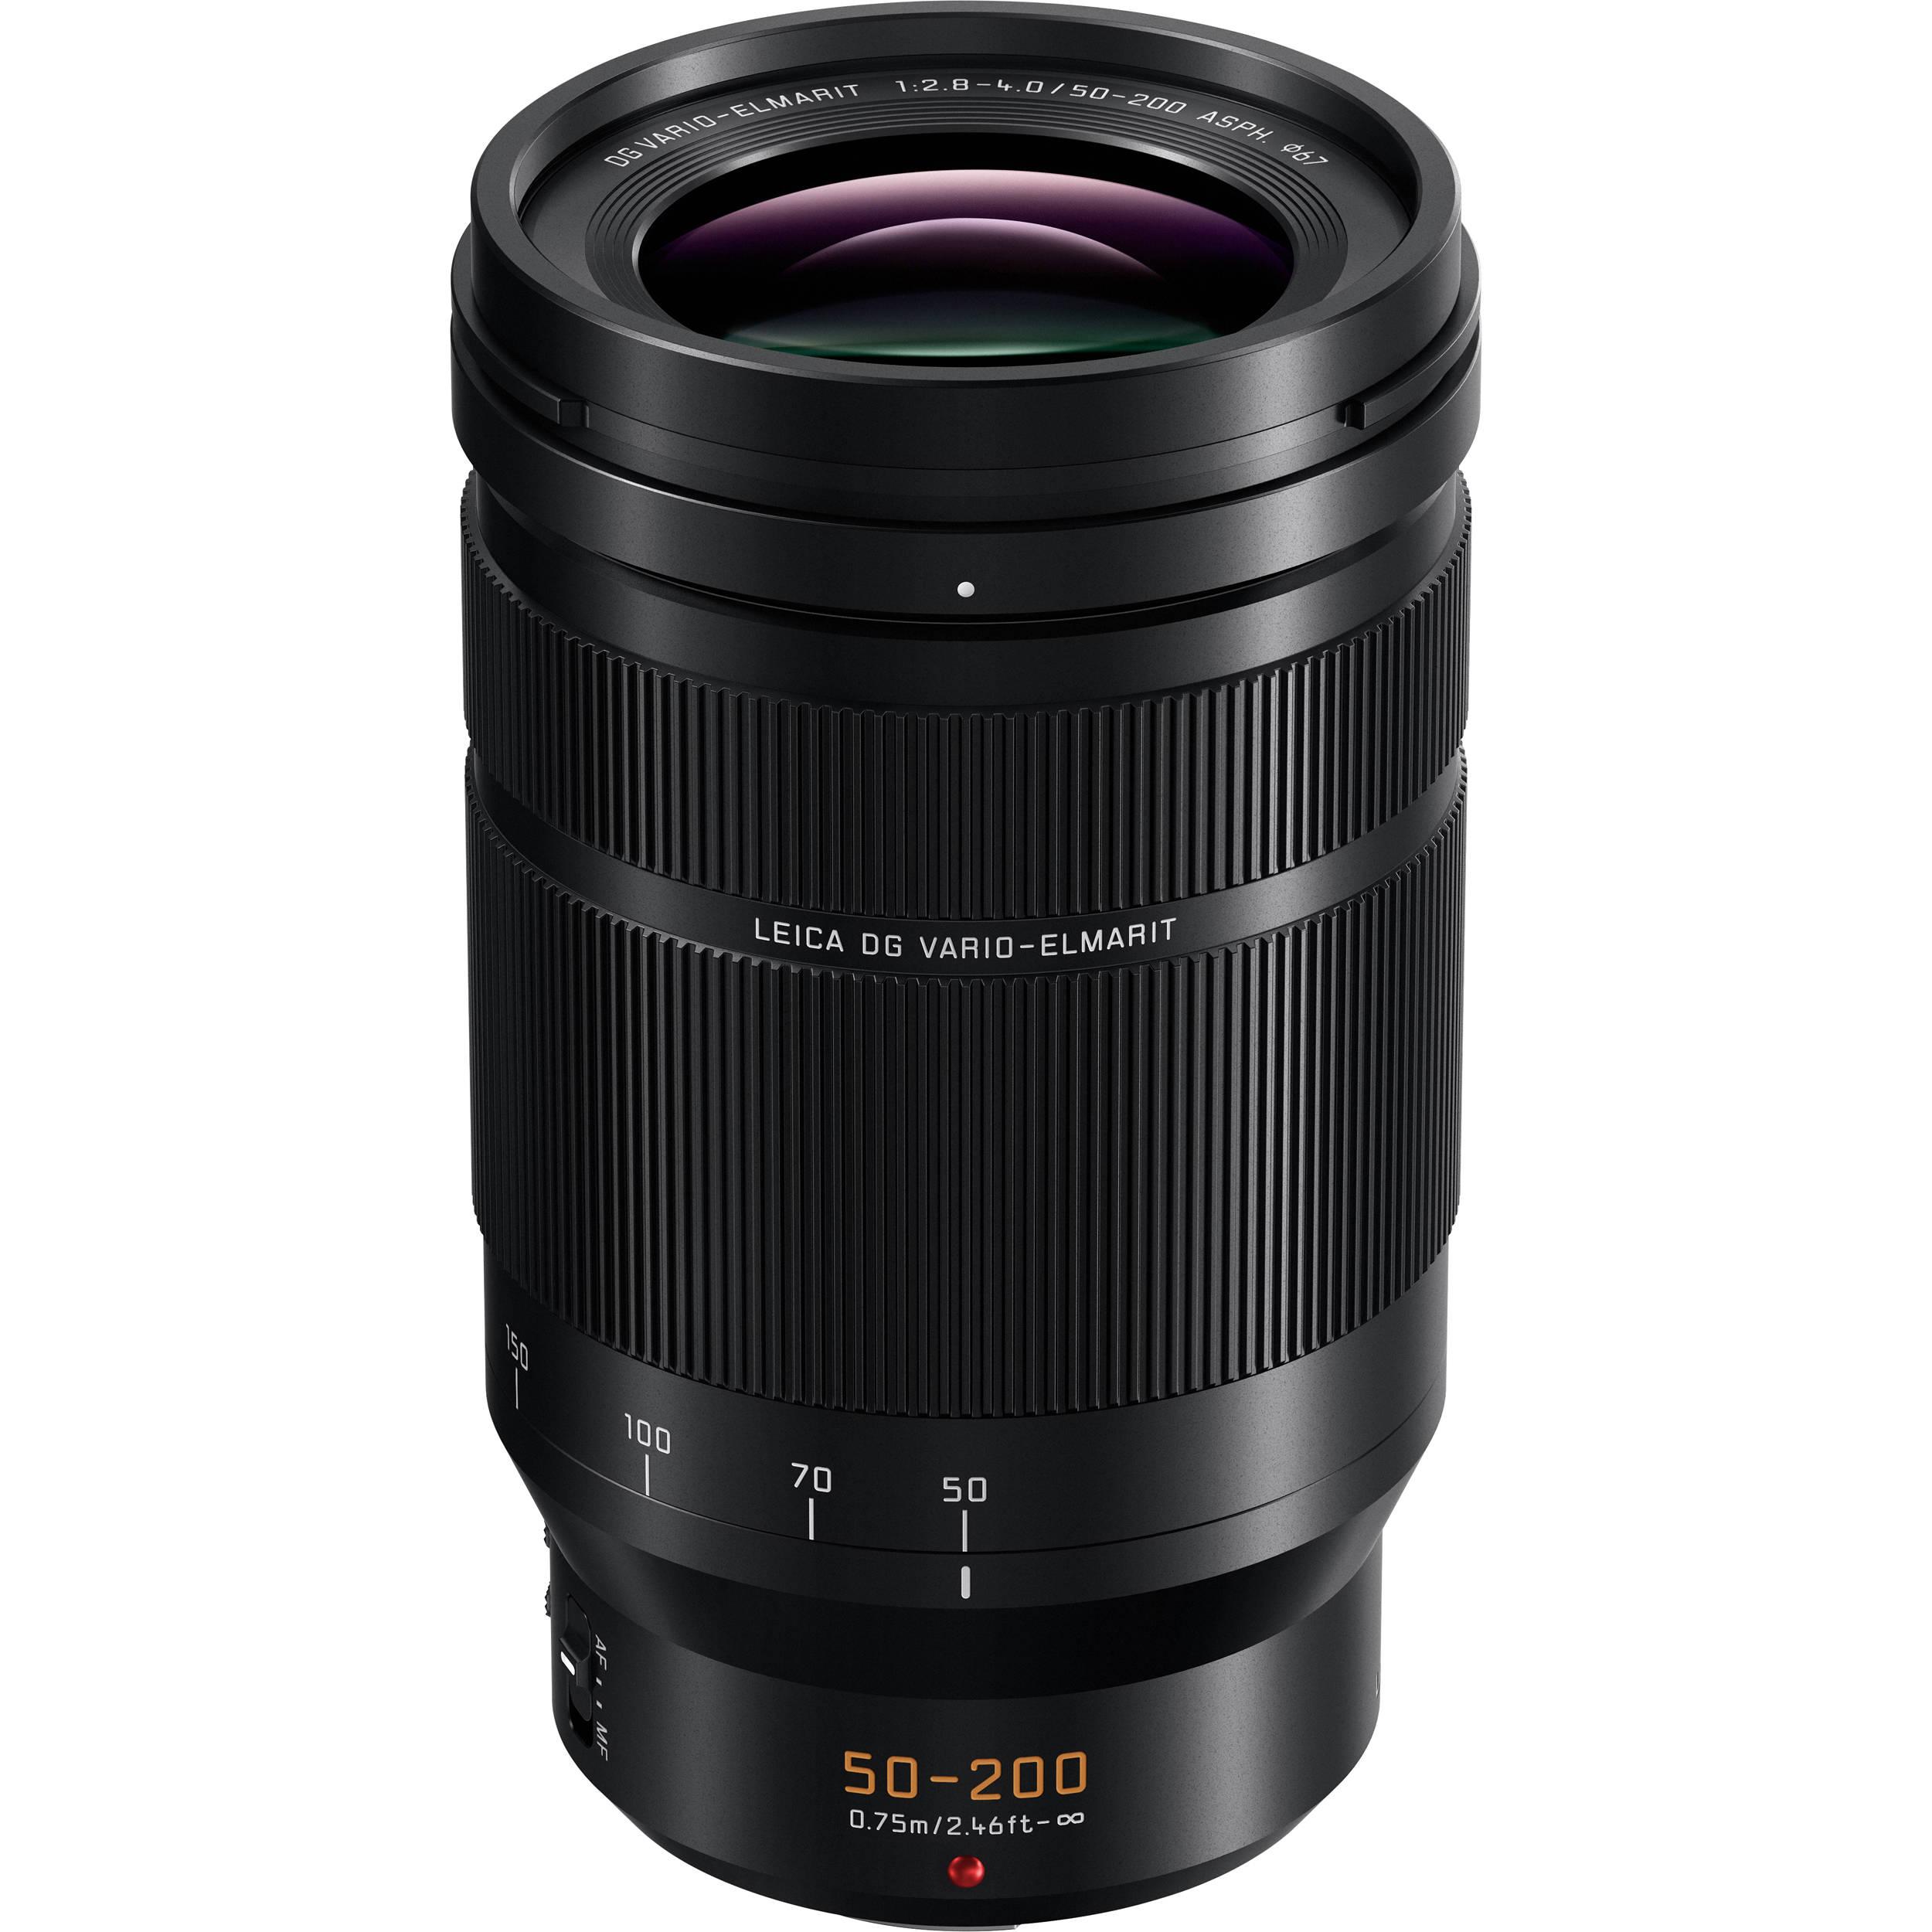 Panasonic Leica Dg Vario Elmarit 50 200mm F 28 4 Asph Power Ois G7 Kit 14 42 Ii Silver 25mm Lens